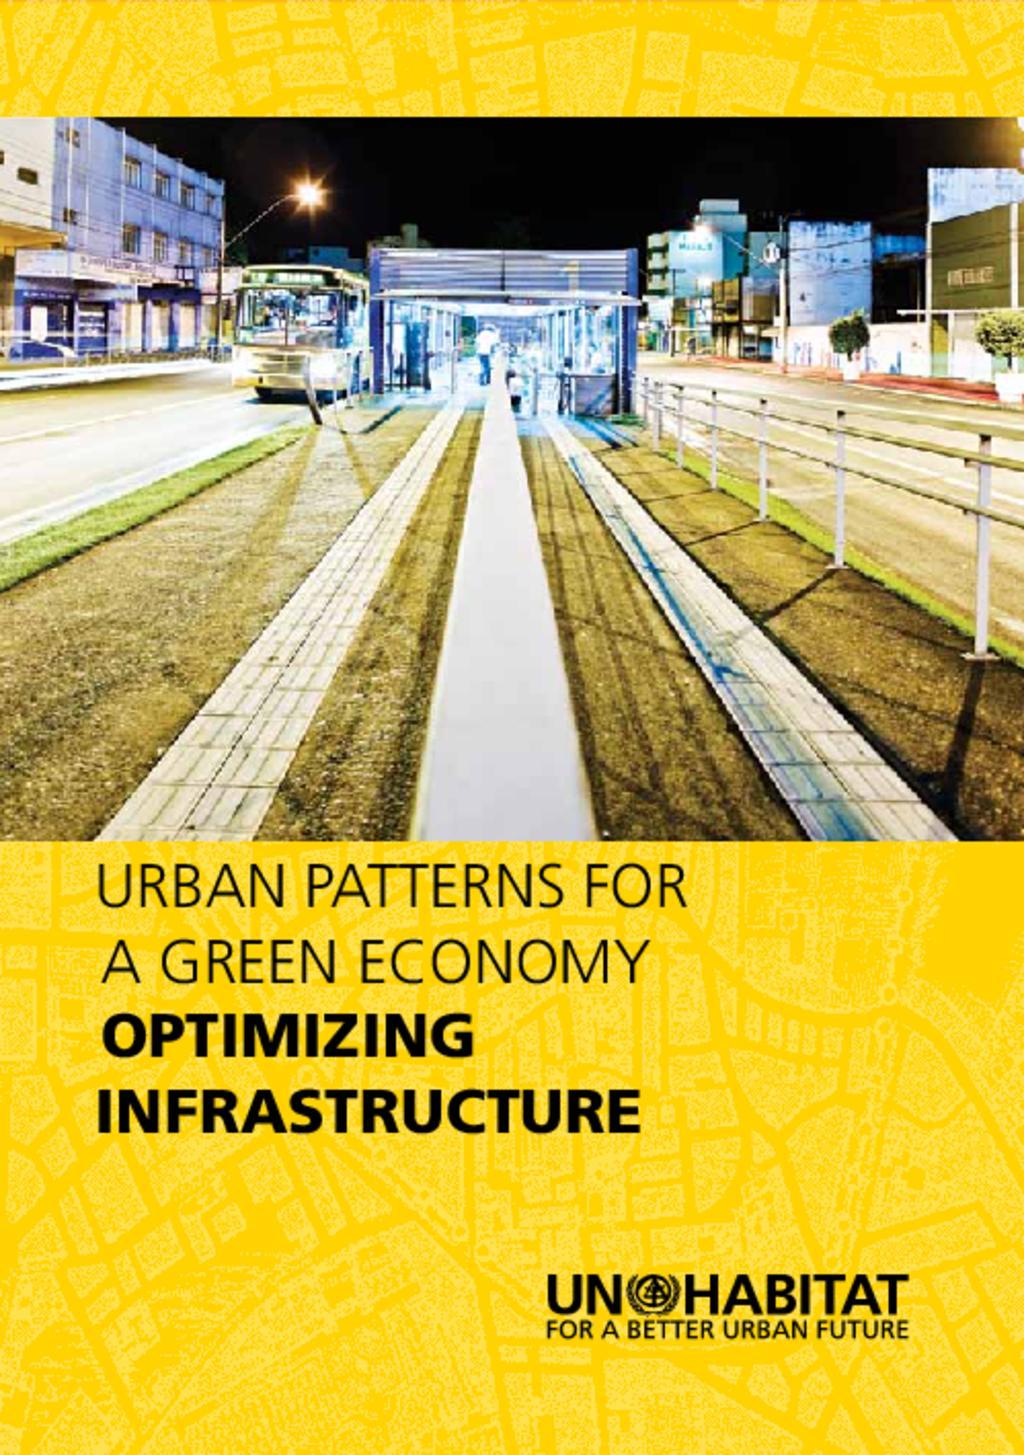 UNhabitat: Otimising Infrastructure